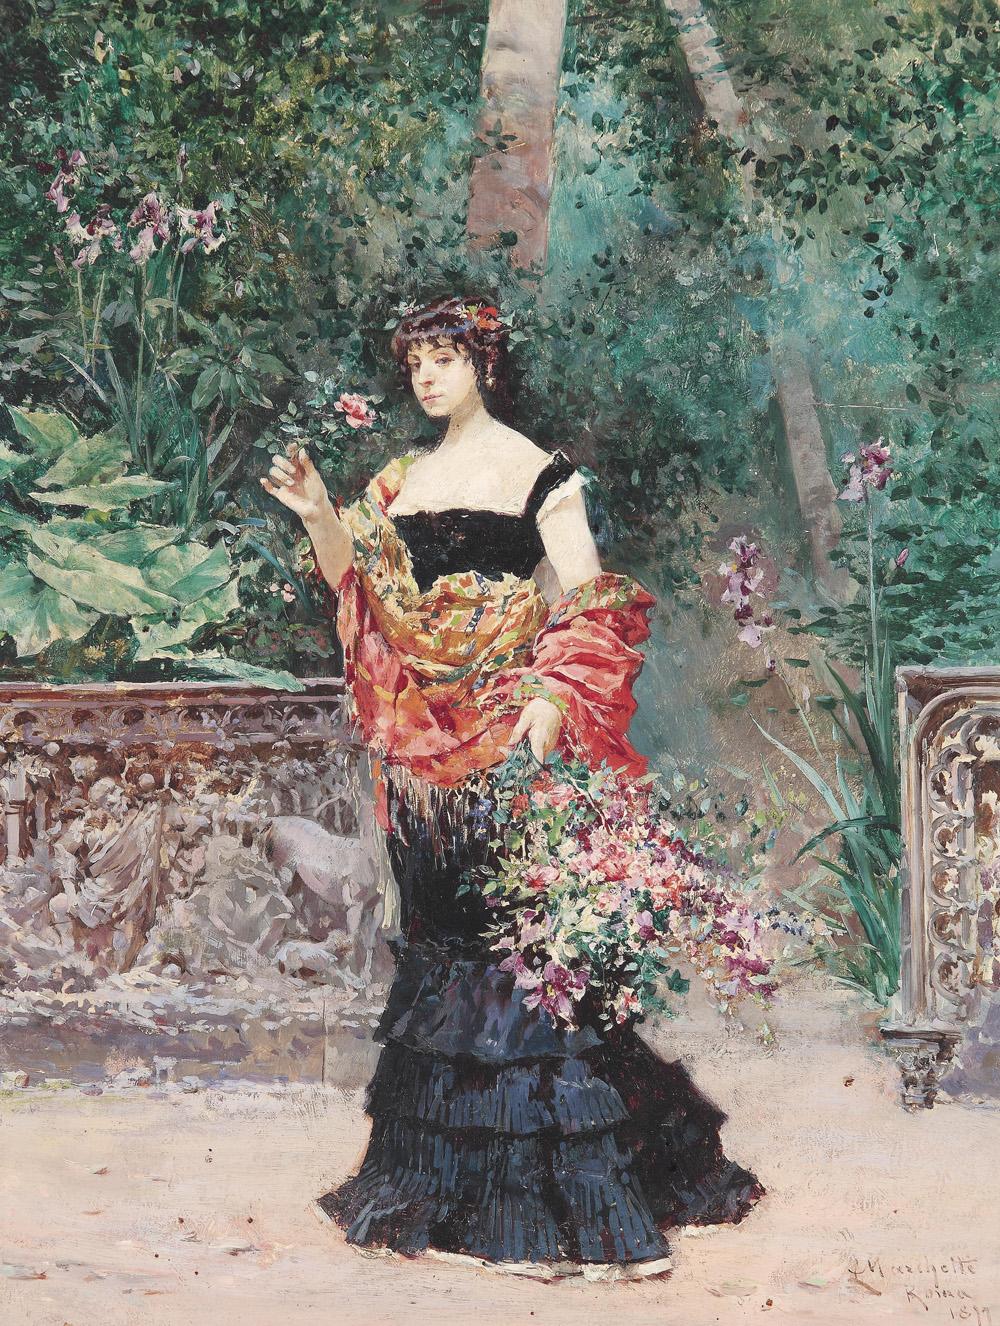 Ludovico_Marchetti_Elegante_Dame_im_Park_1899.jpg